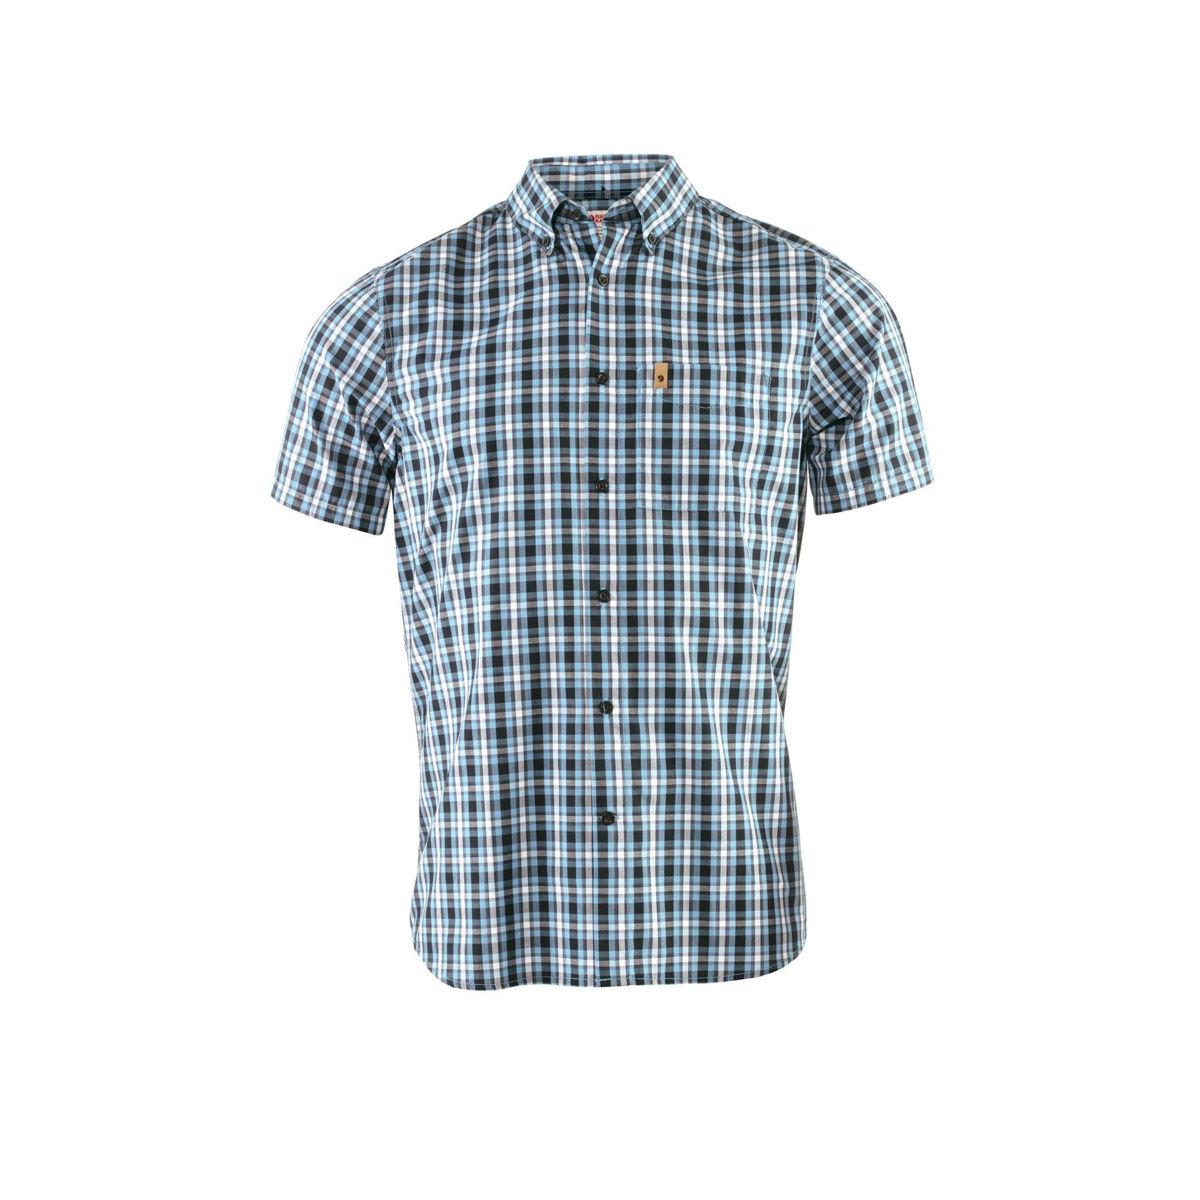 Bilde av Övik Shirt SS M